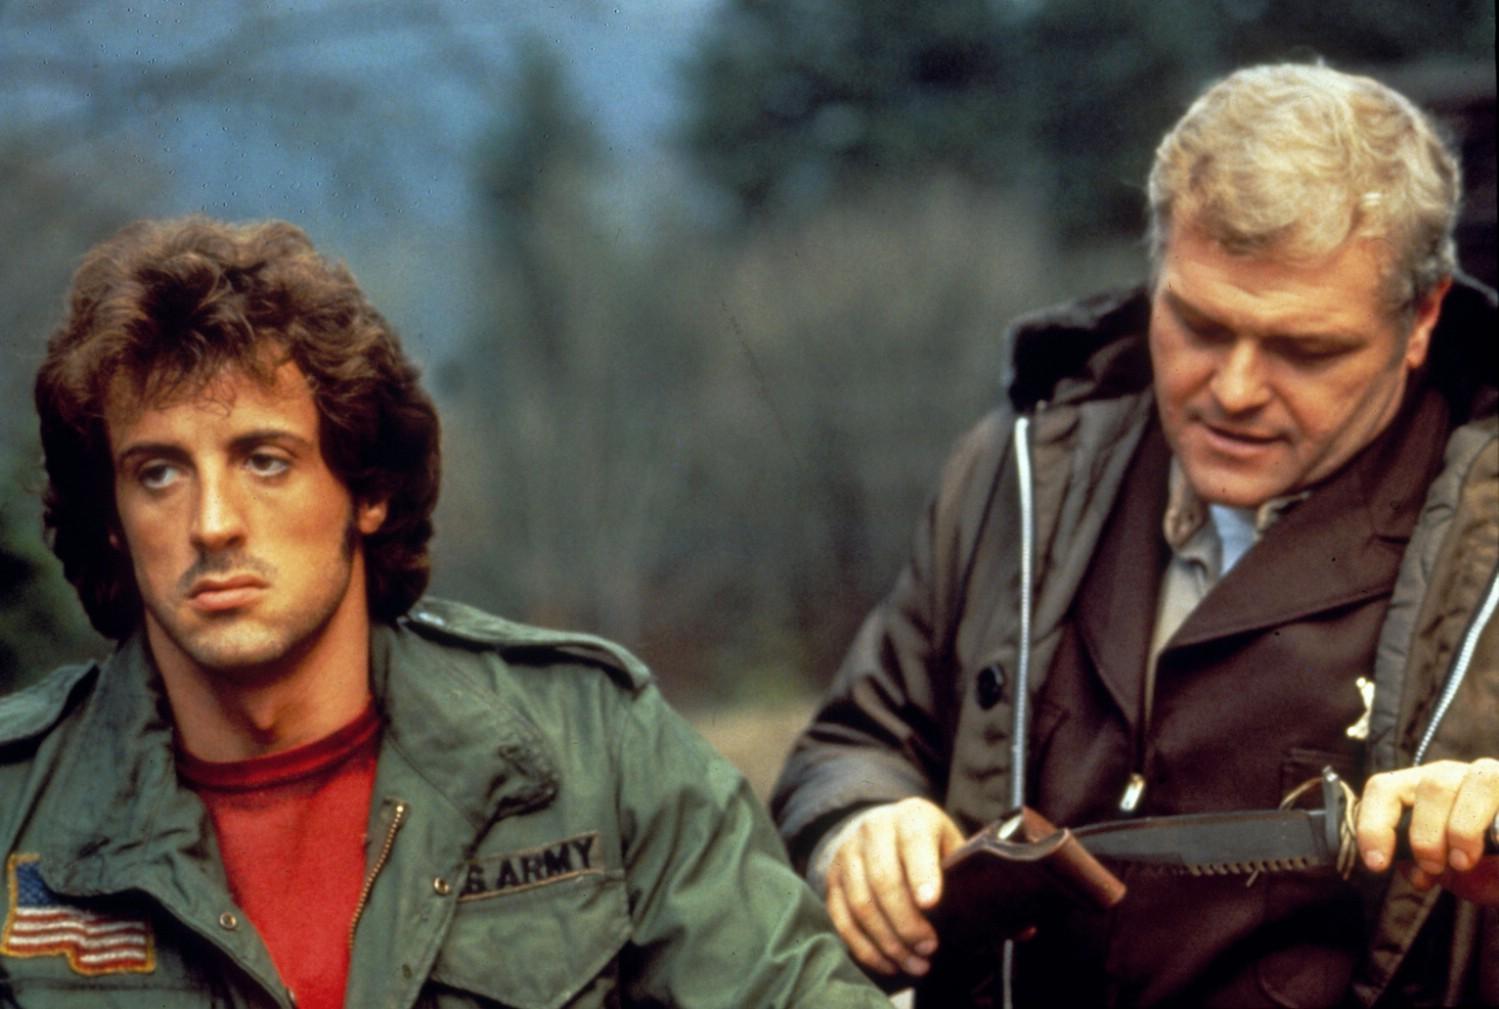 Rambo First Blood 28502 High - نسخه ای متفاوت از Rambo 4 که شاهد بازگشت شخصیت منفی اولین خون بود